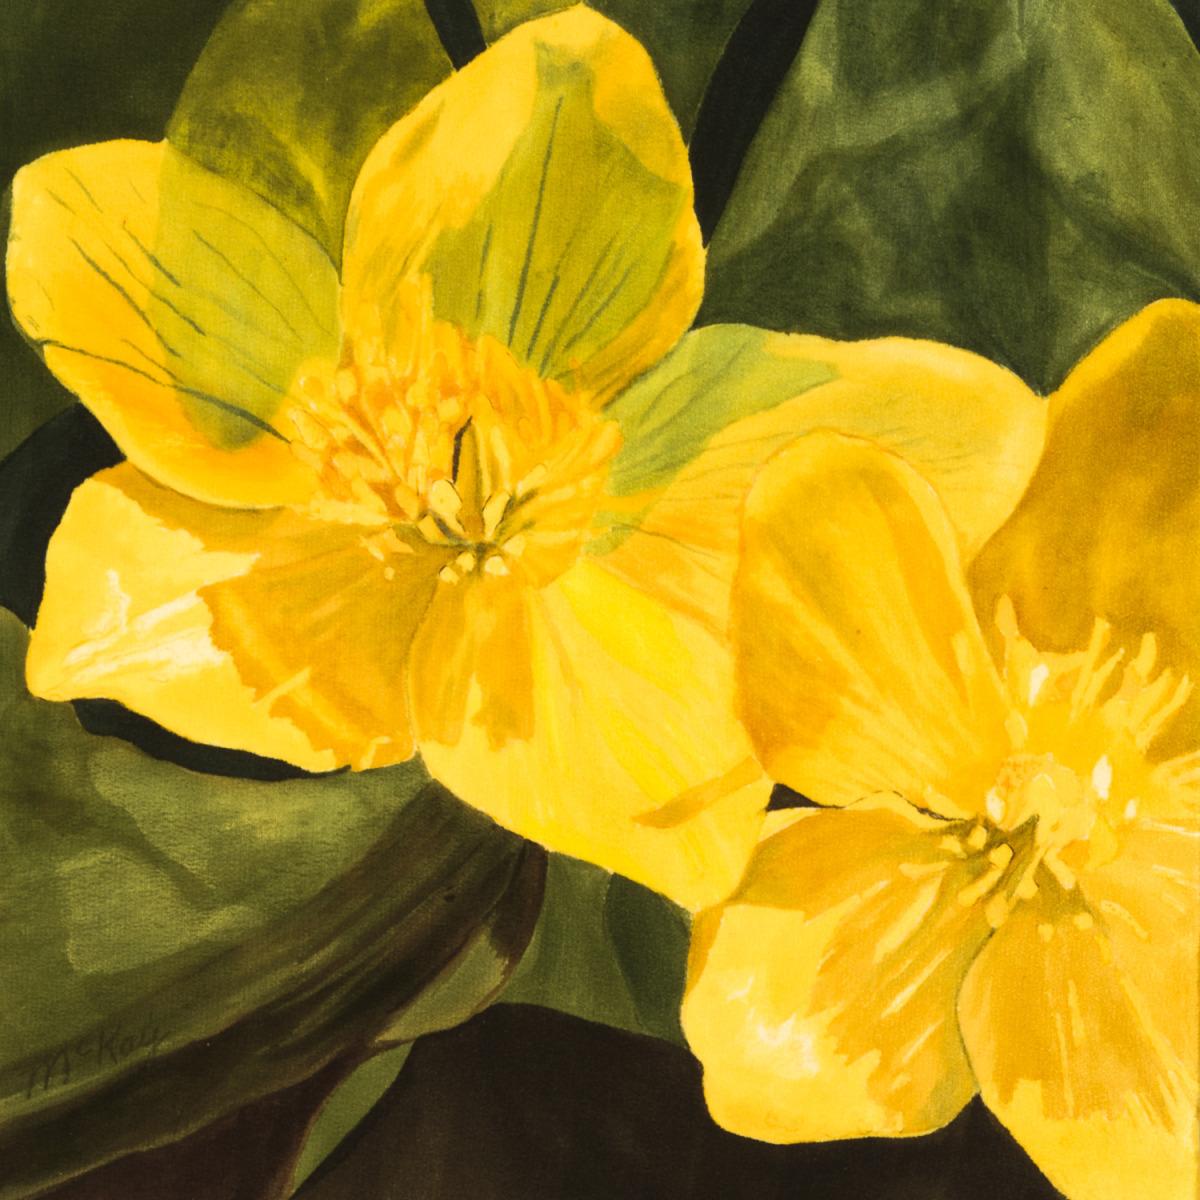 Marsh Marigolds #2 (large view)